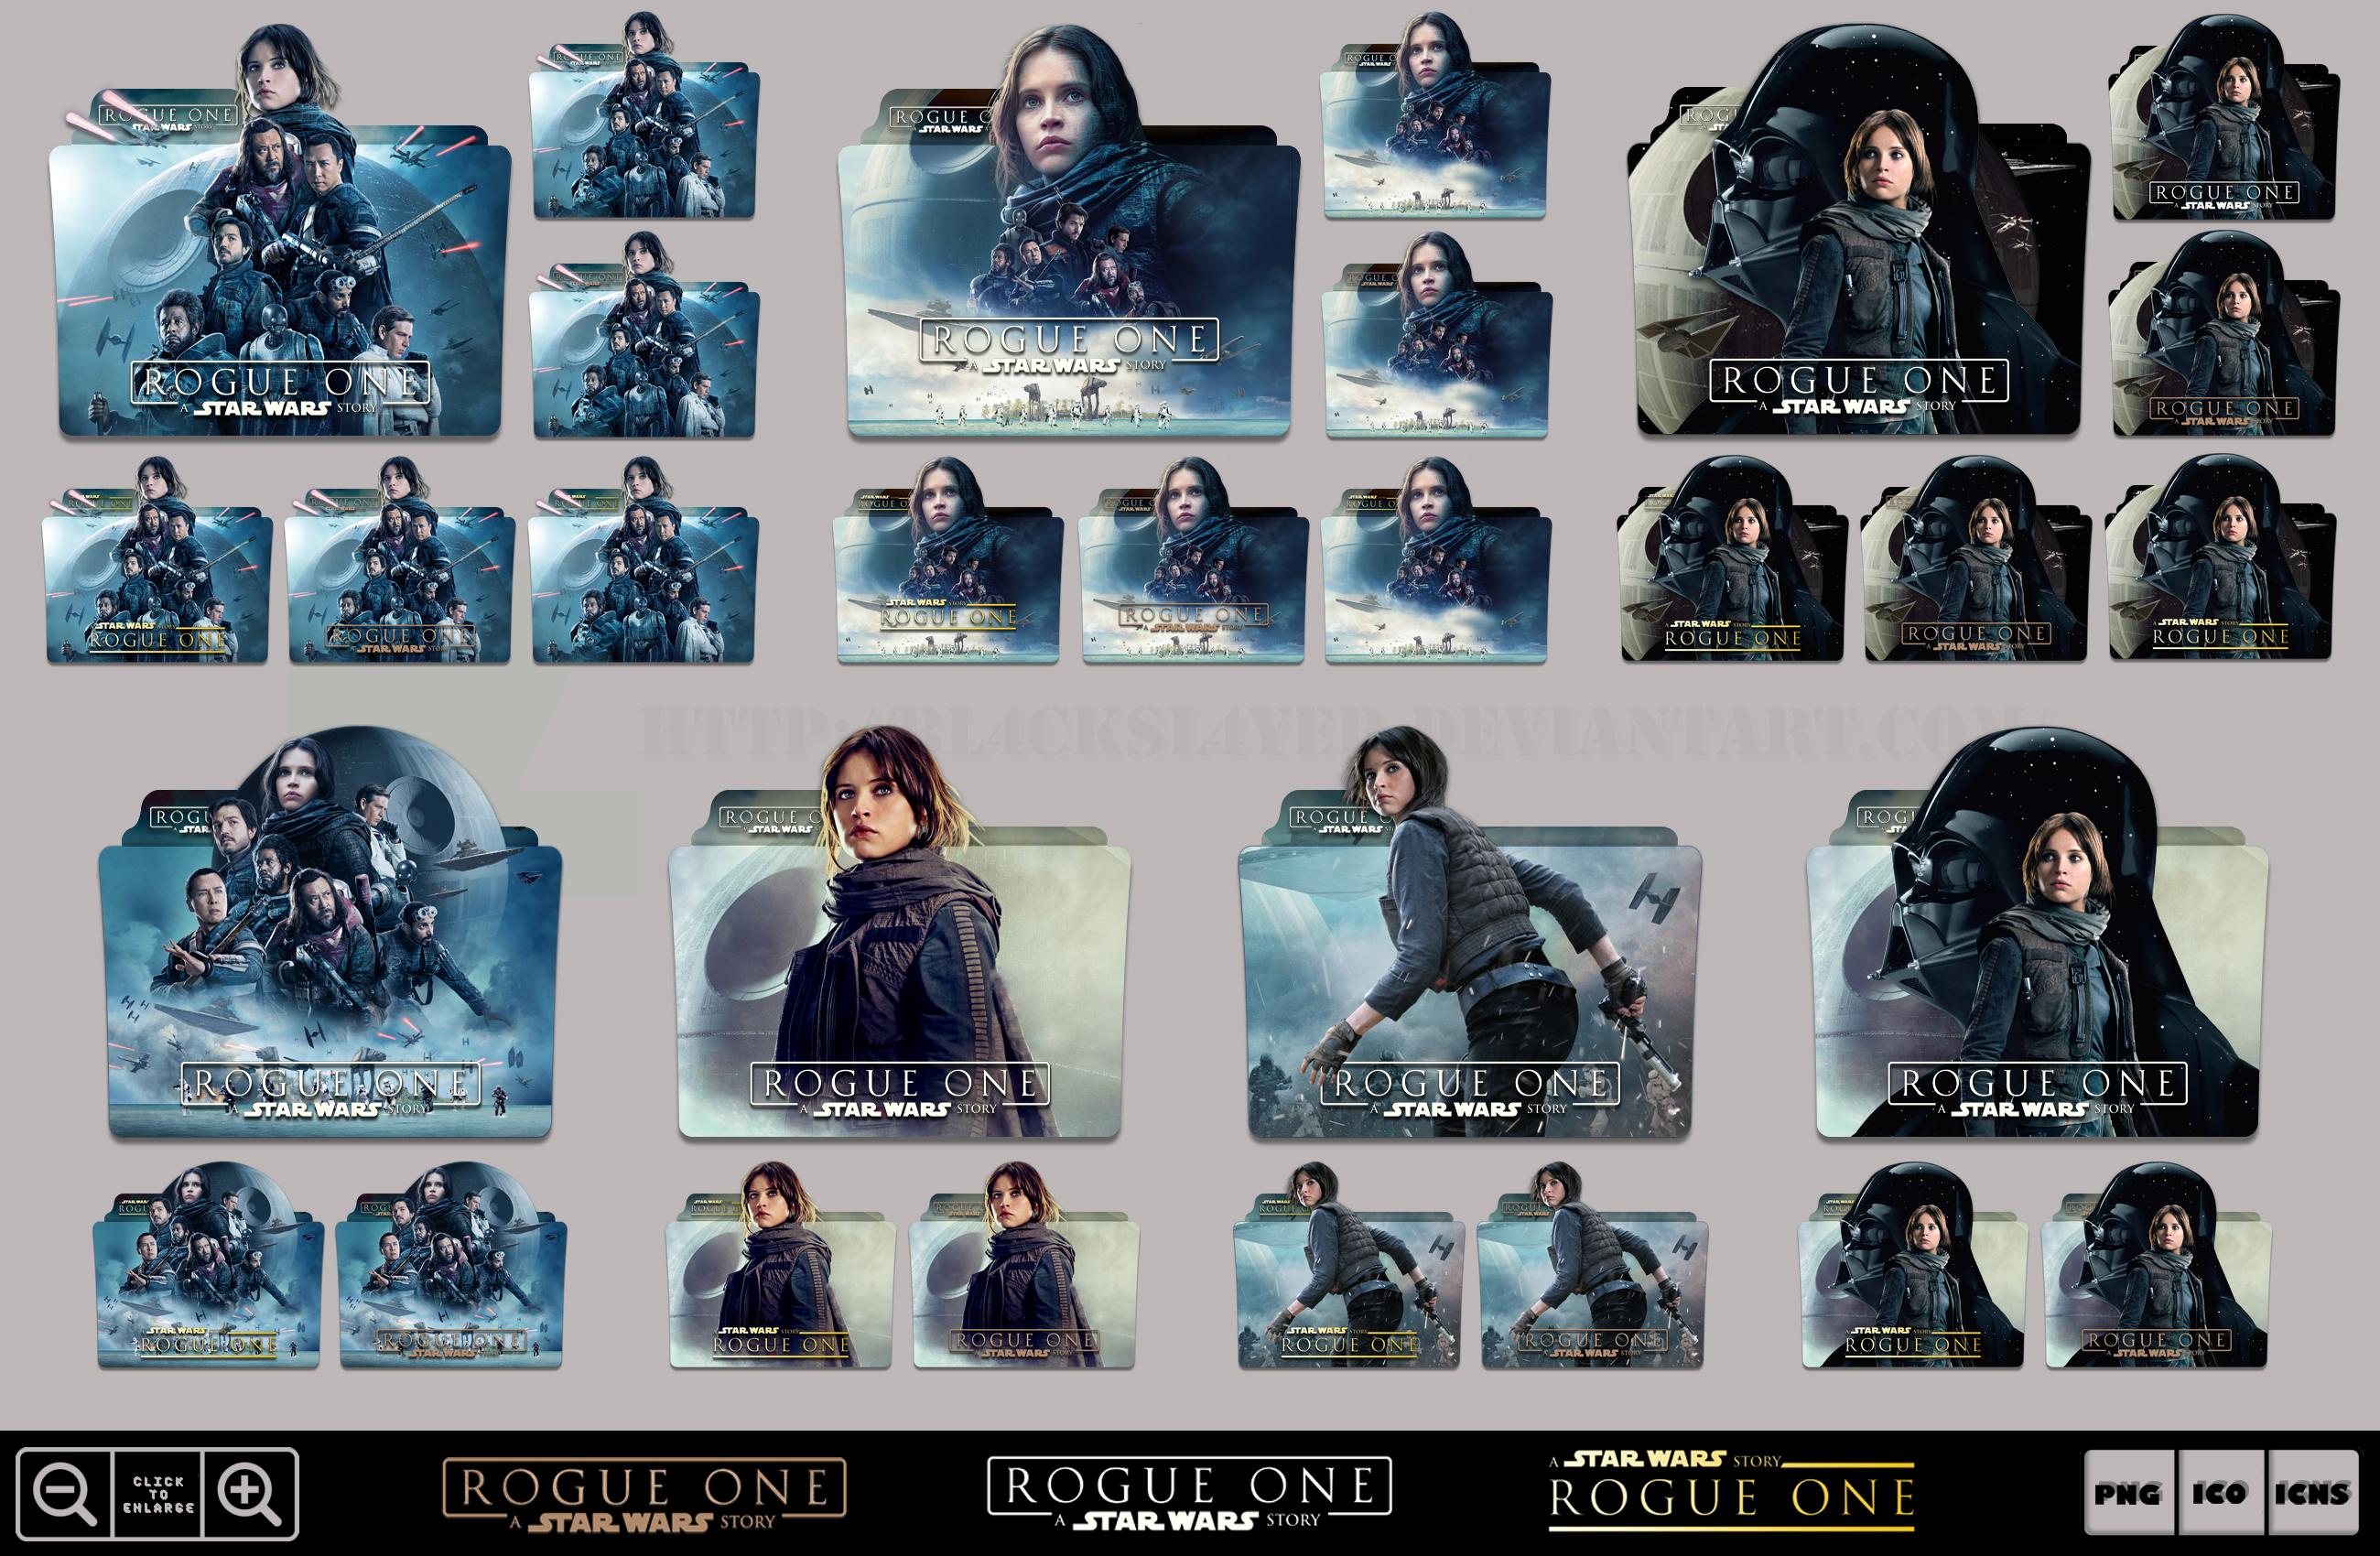 Rogue One A Star Wars Story 2016 Folder Pack 2 By Bl4cksl4yer On Deviantart